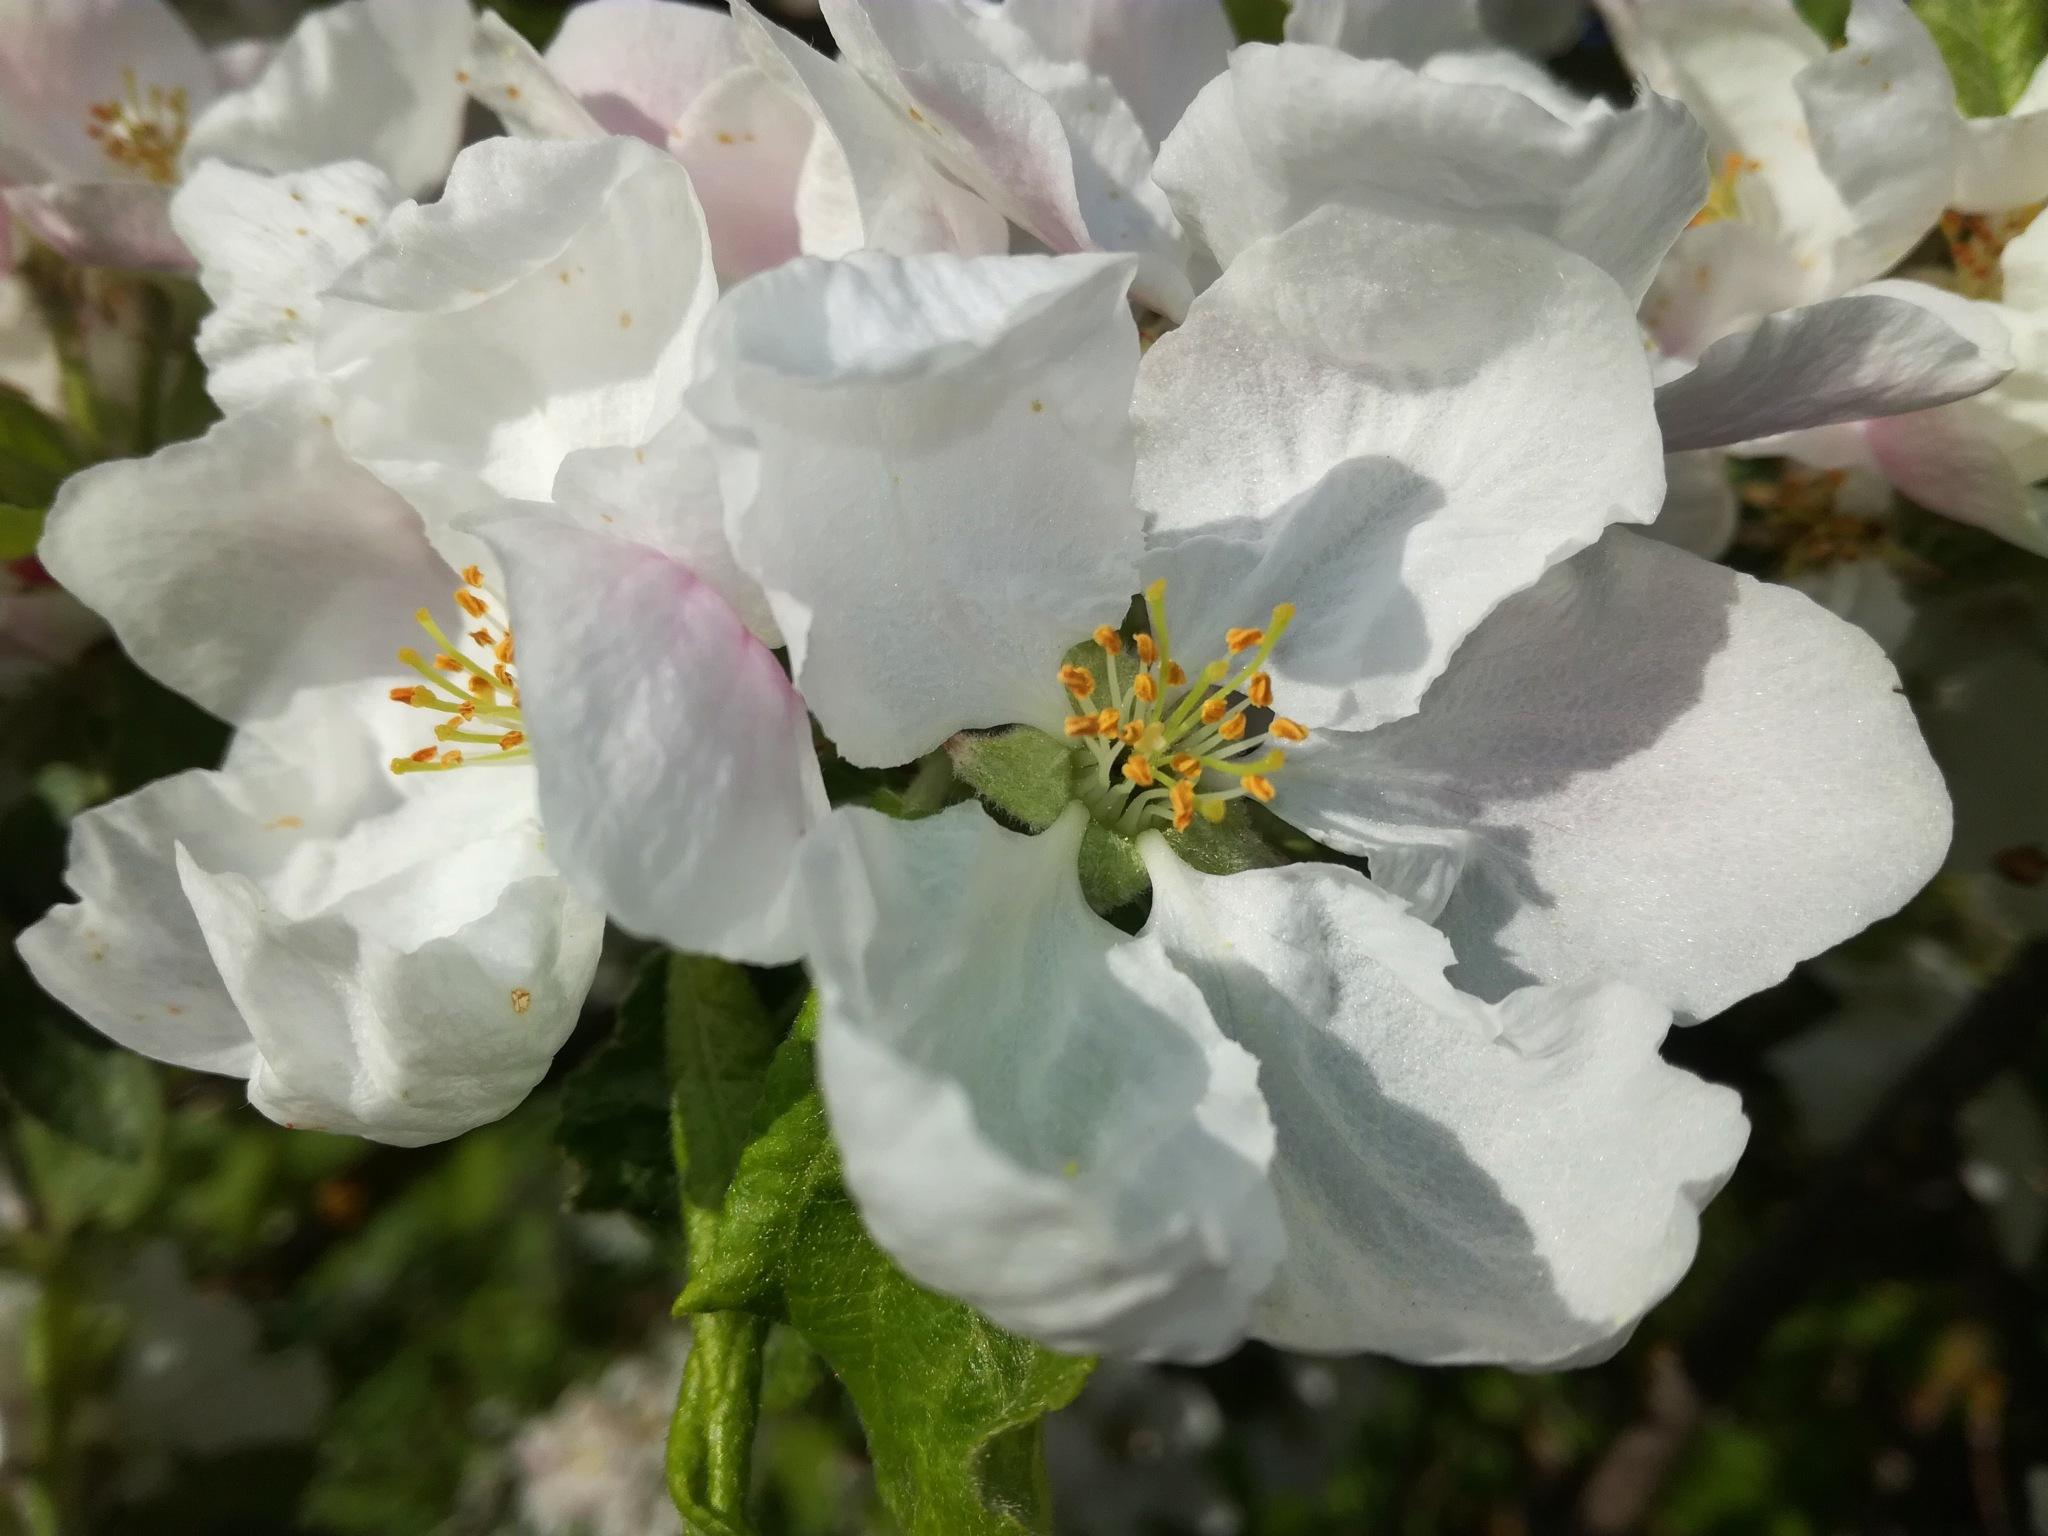 Apple blossoms by uzkuraitiene62